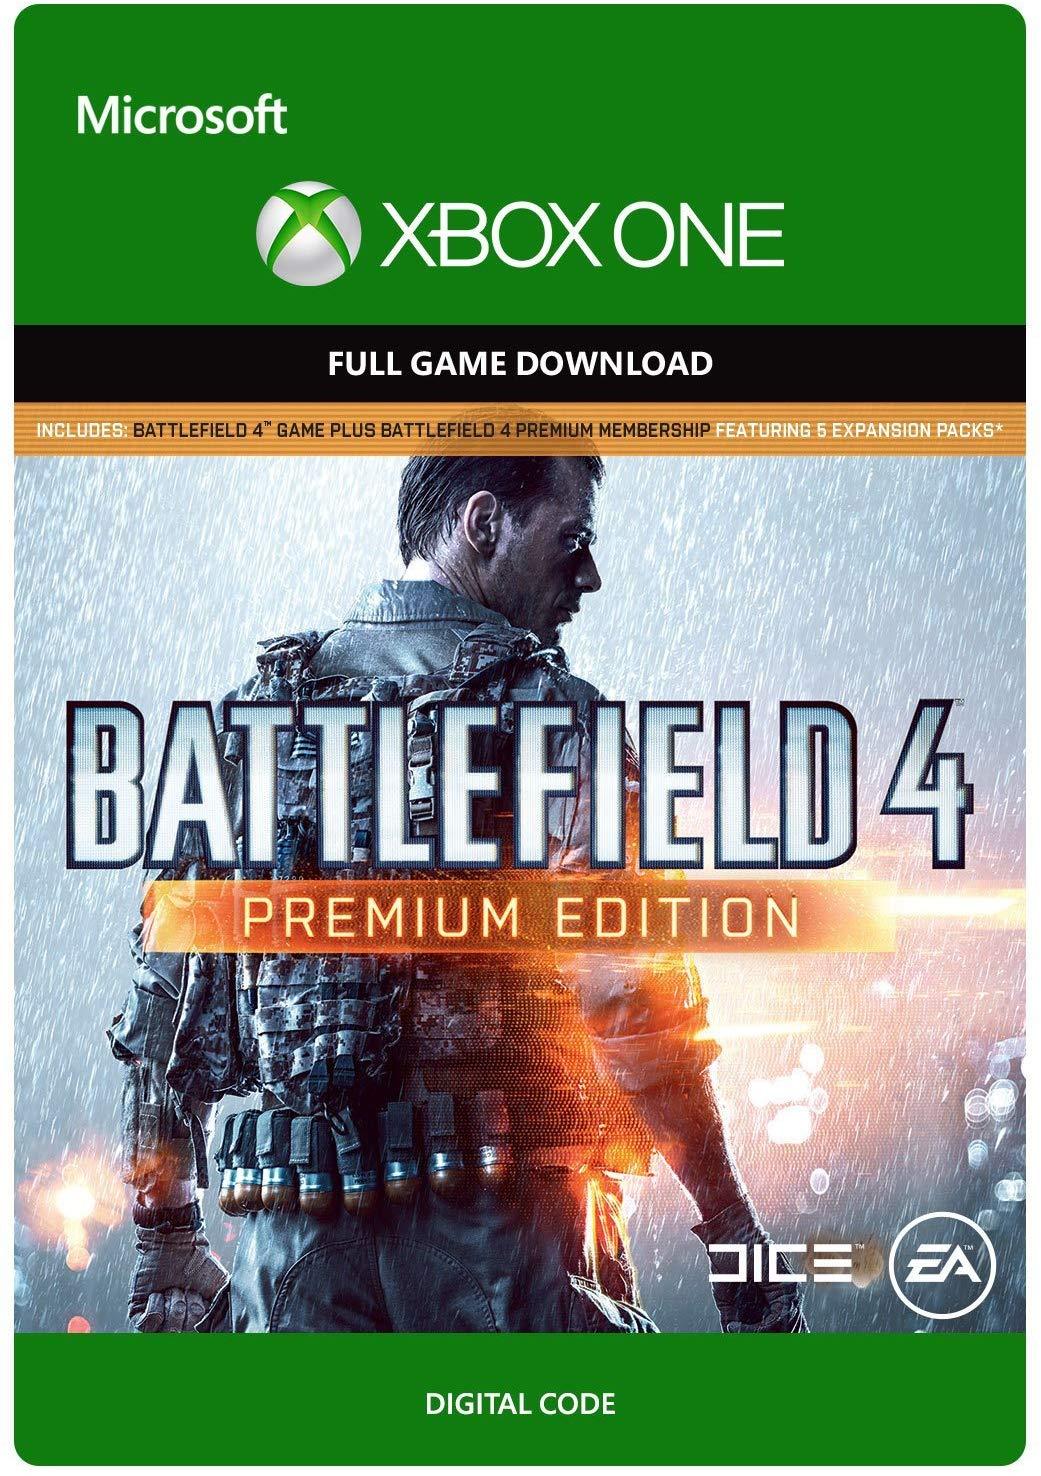 Battlefield 4: Premium Edition - Xbox One Digital Code. $10 @ Amazon